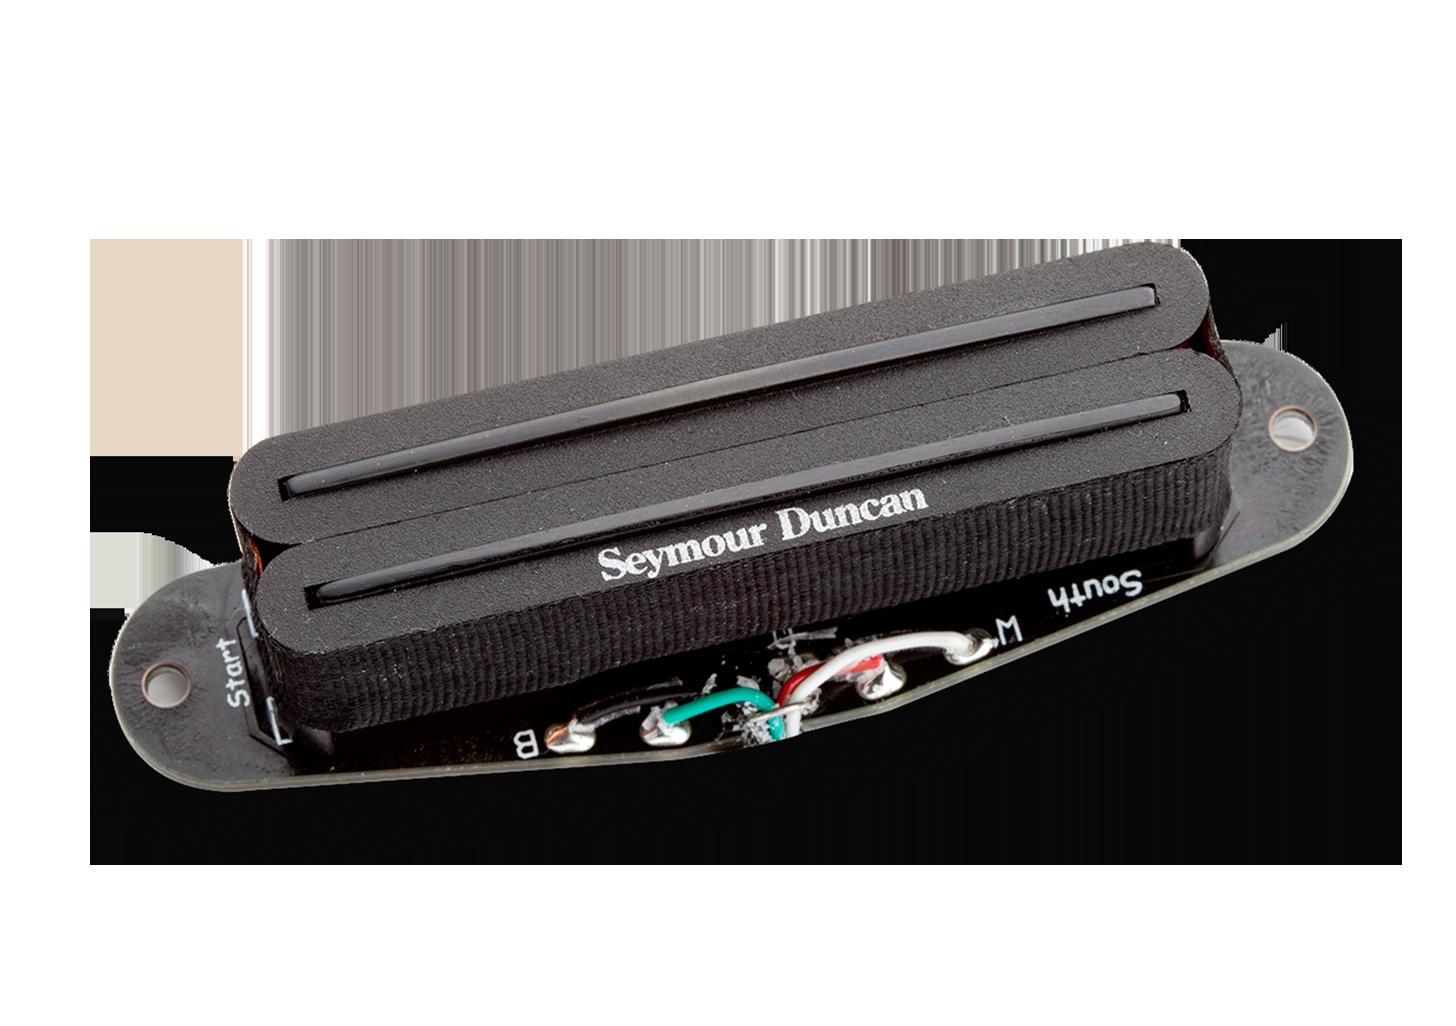 Seymour Duncan Hot Rails Tele - STHR-1N Neck